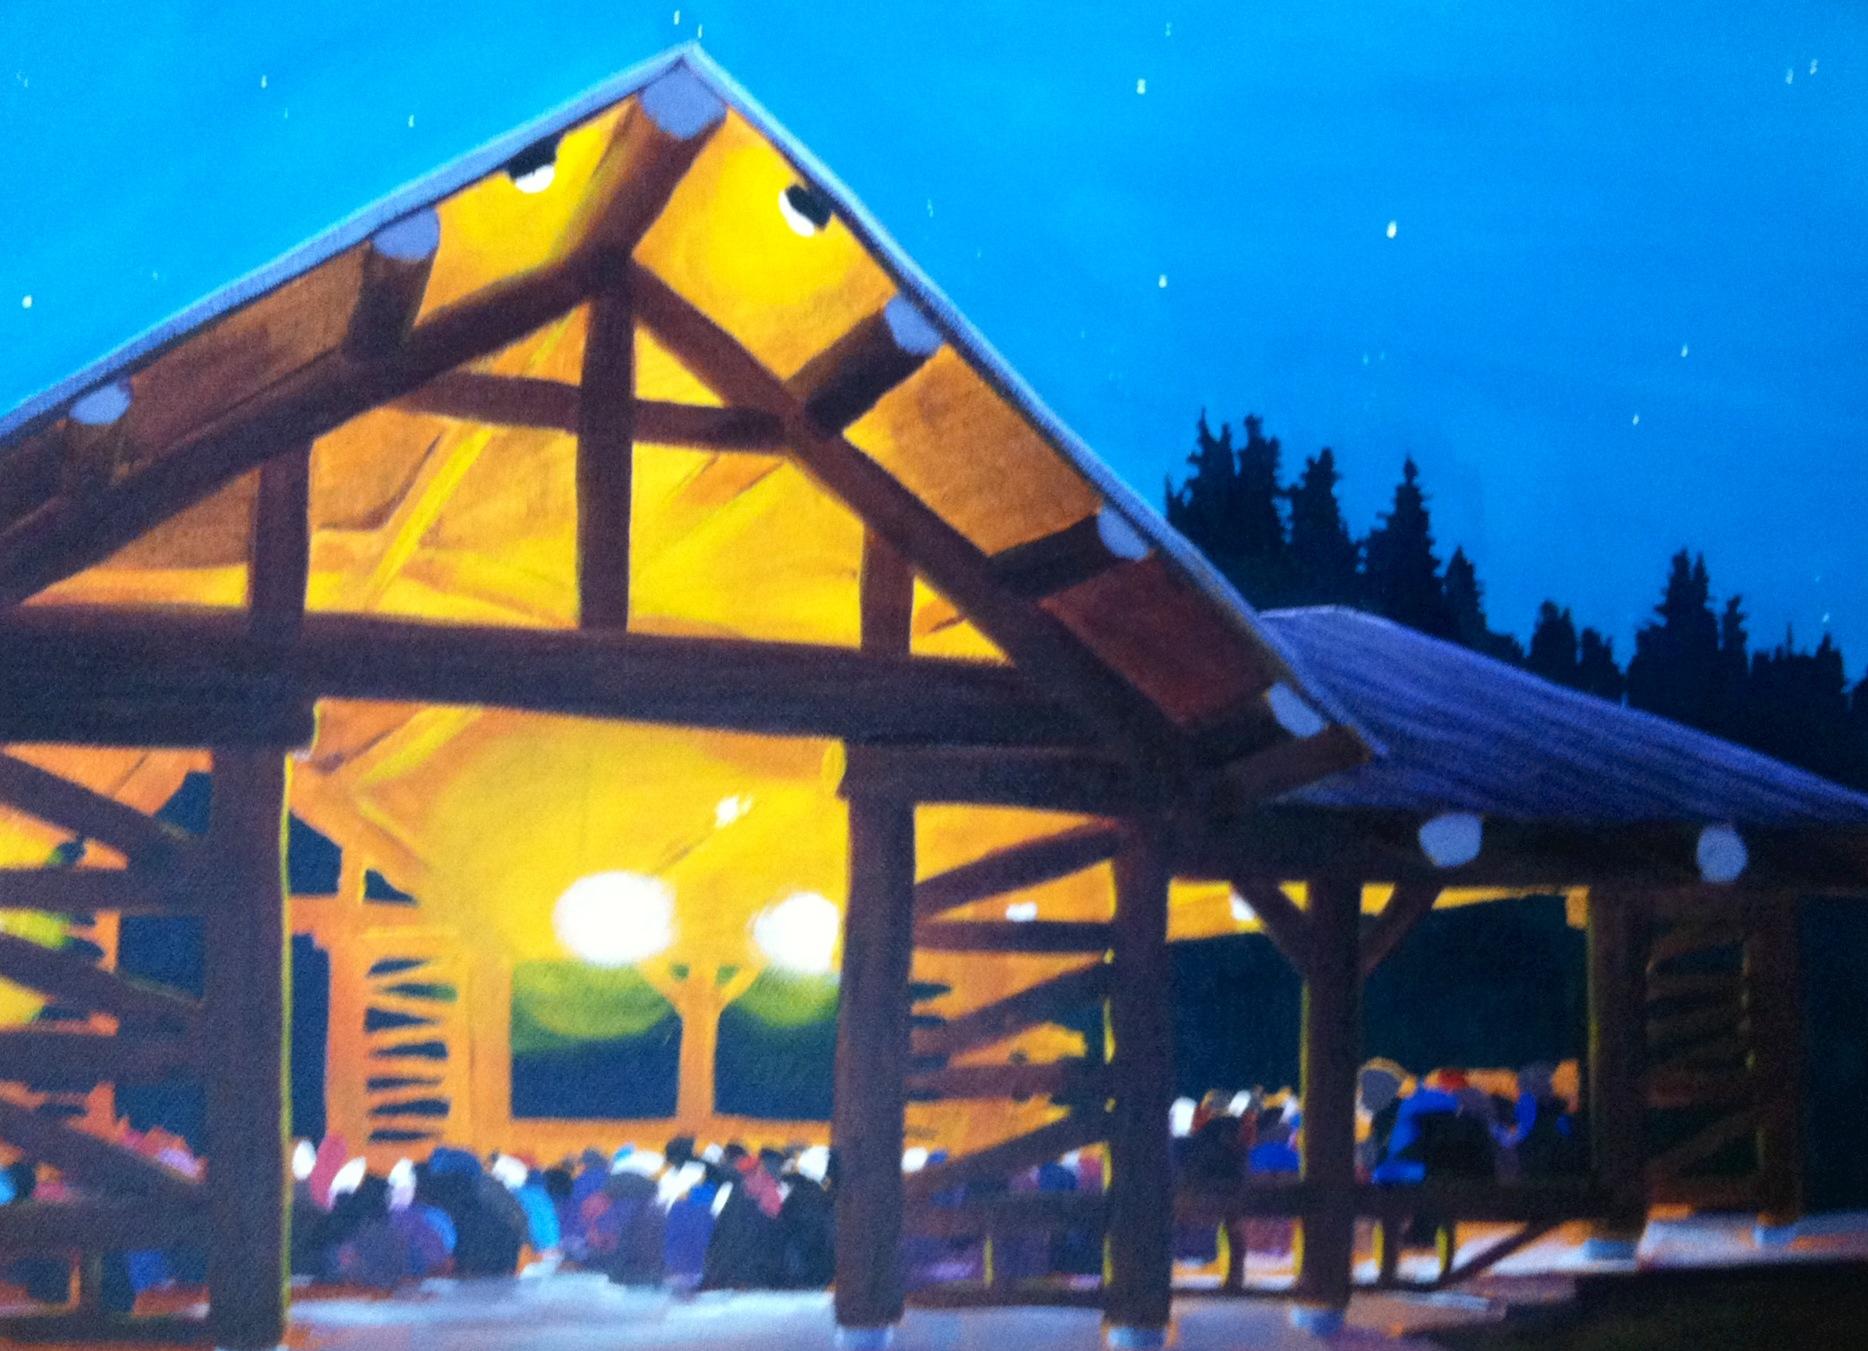 Pavilion at Night